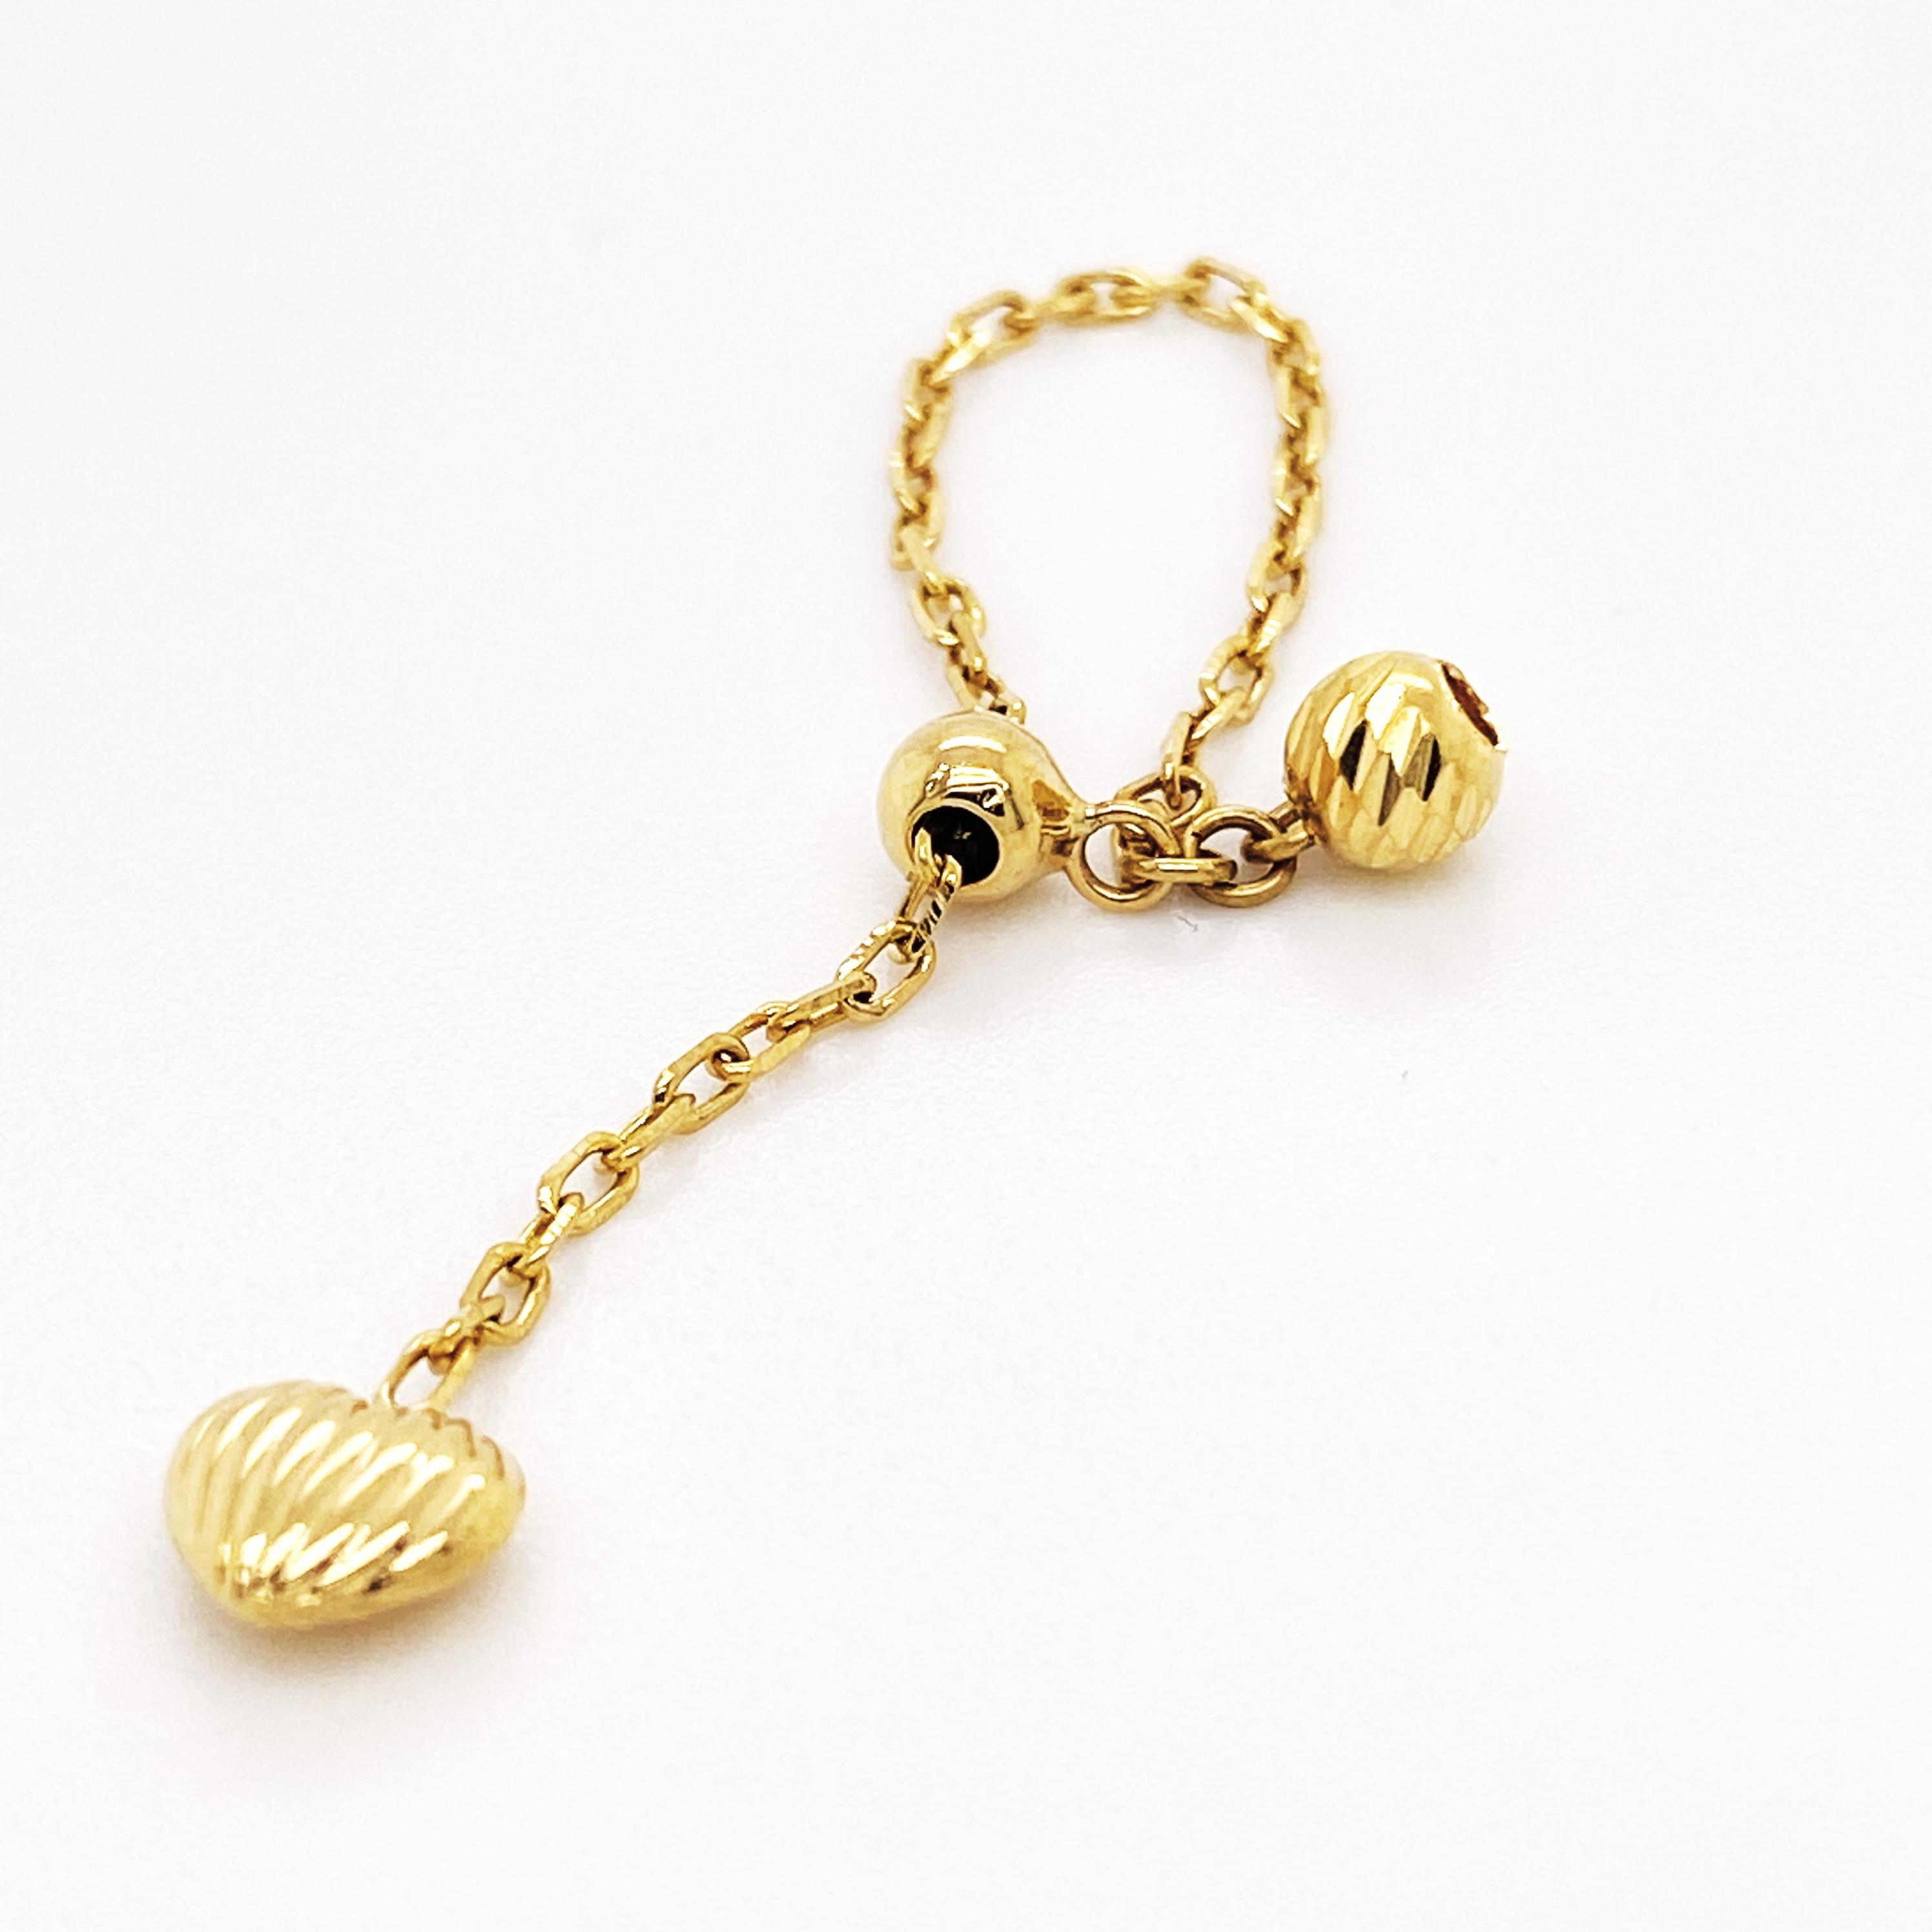 0.82 grams 18k SD Gold Adjustable ring